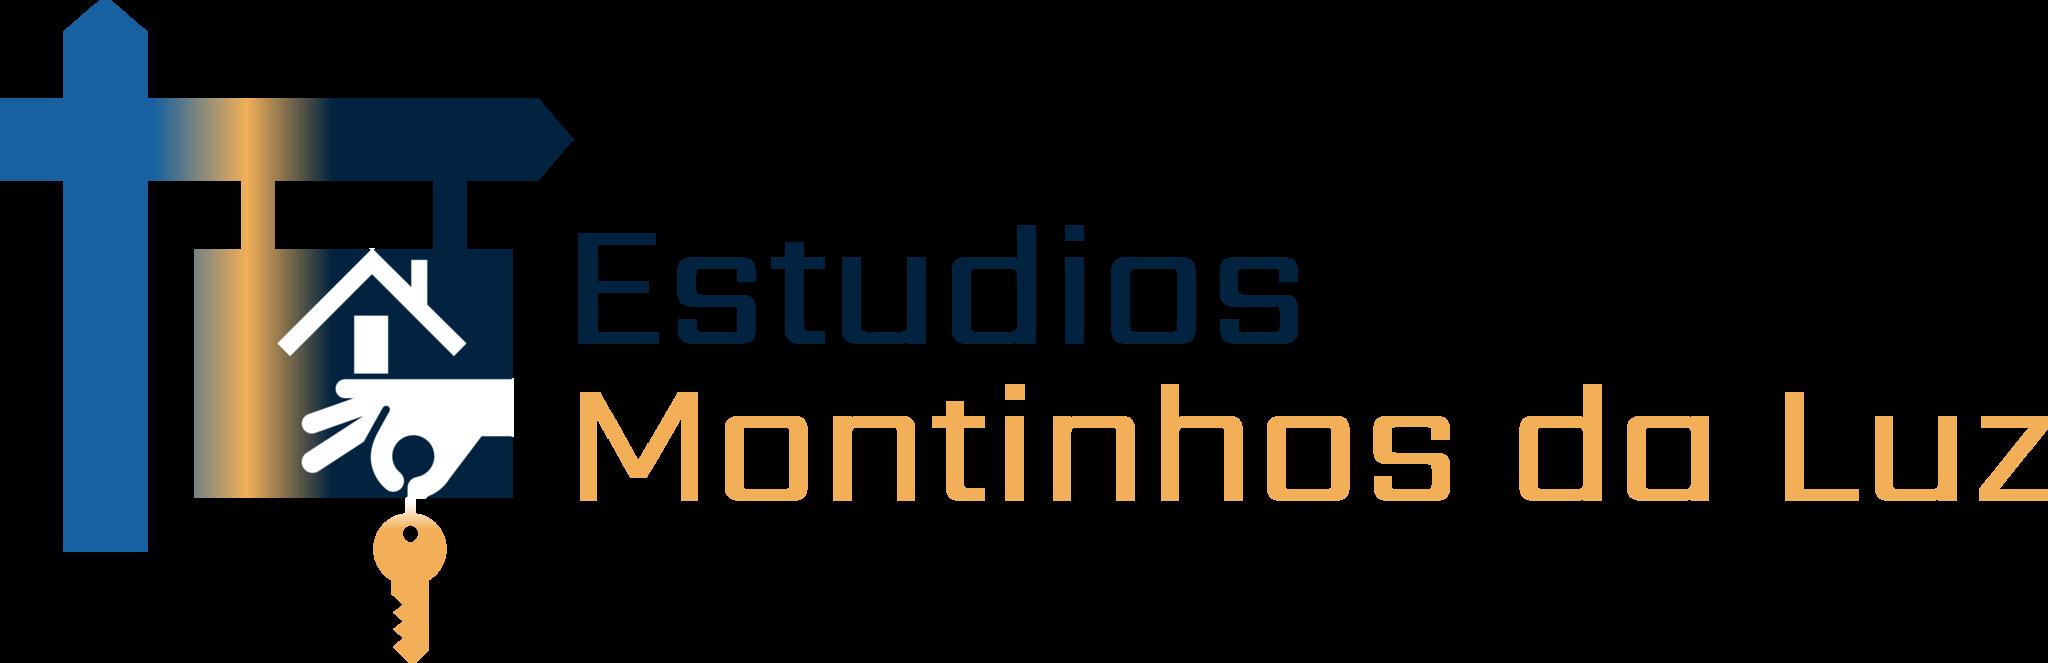 Estudios Montinhos Da Luz by Seewest